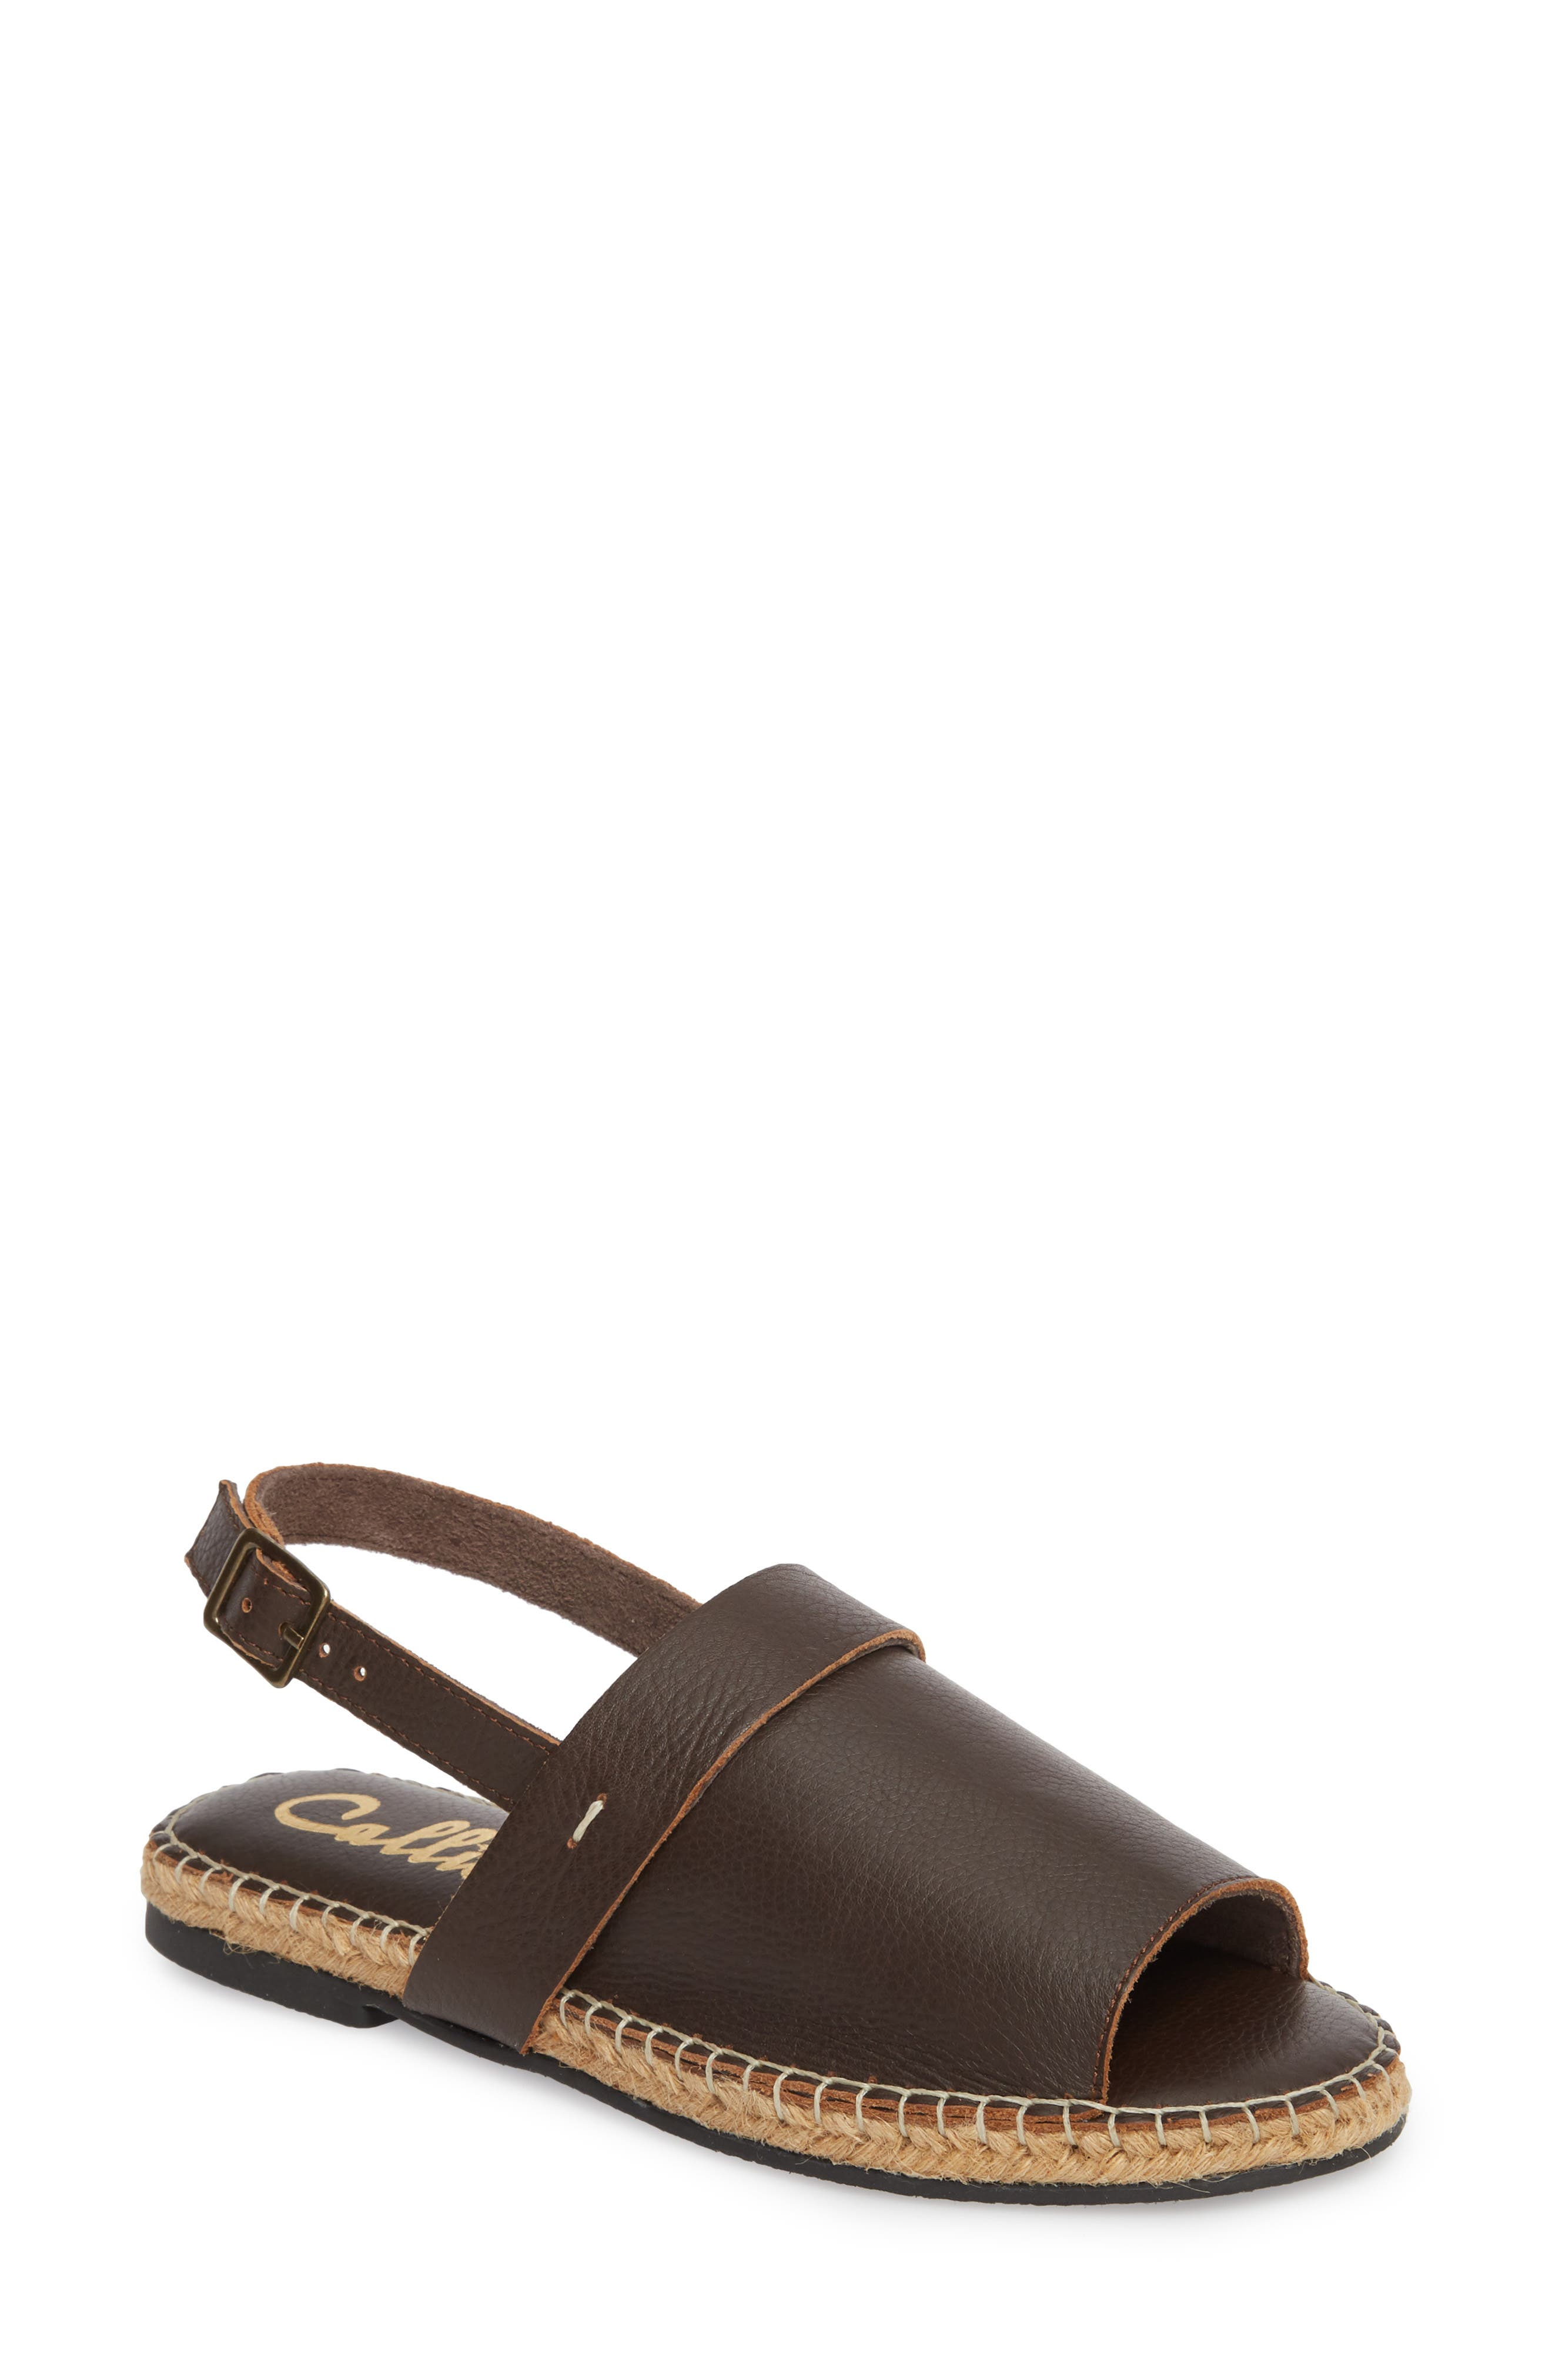 Turn Key Espadrille Sandal,                             Main thumbnail 1, color,                             Brown Leather